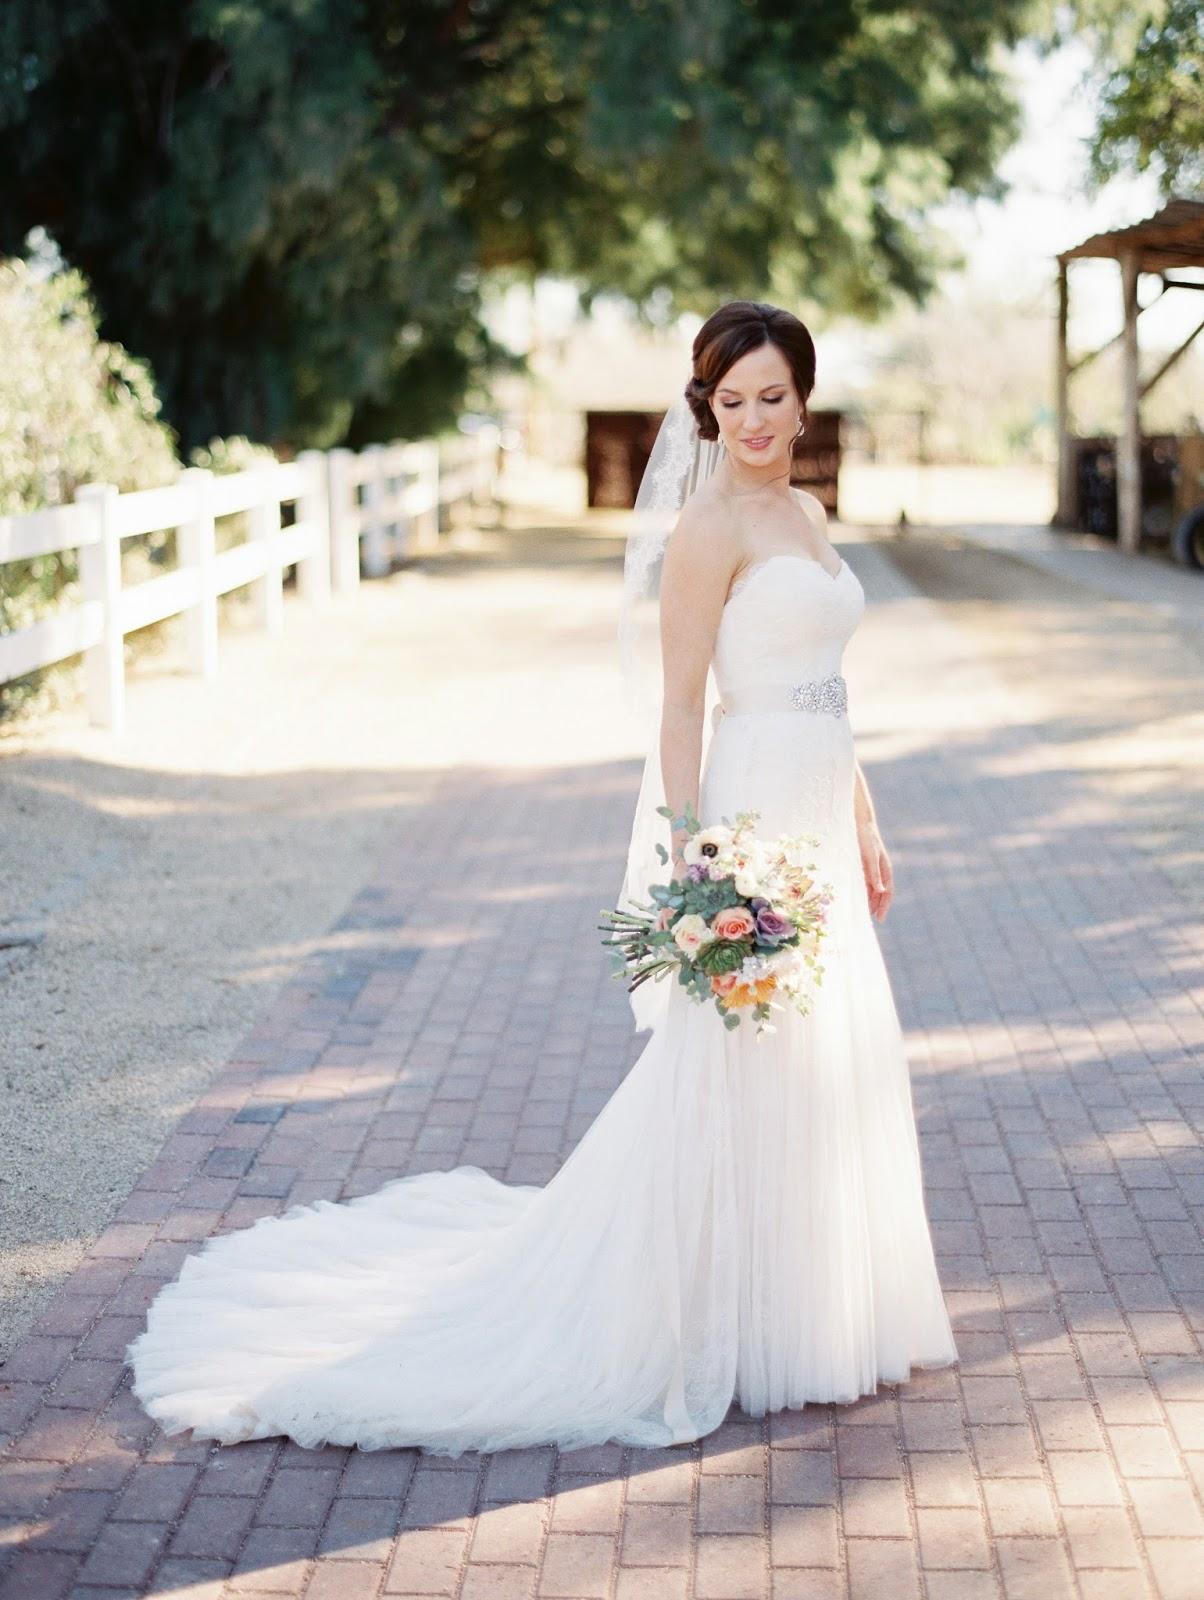 alicia simply boutonniere lavender weddings